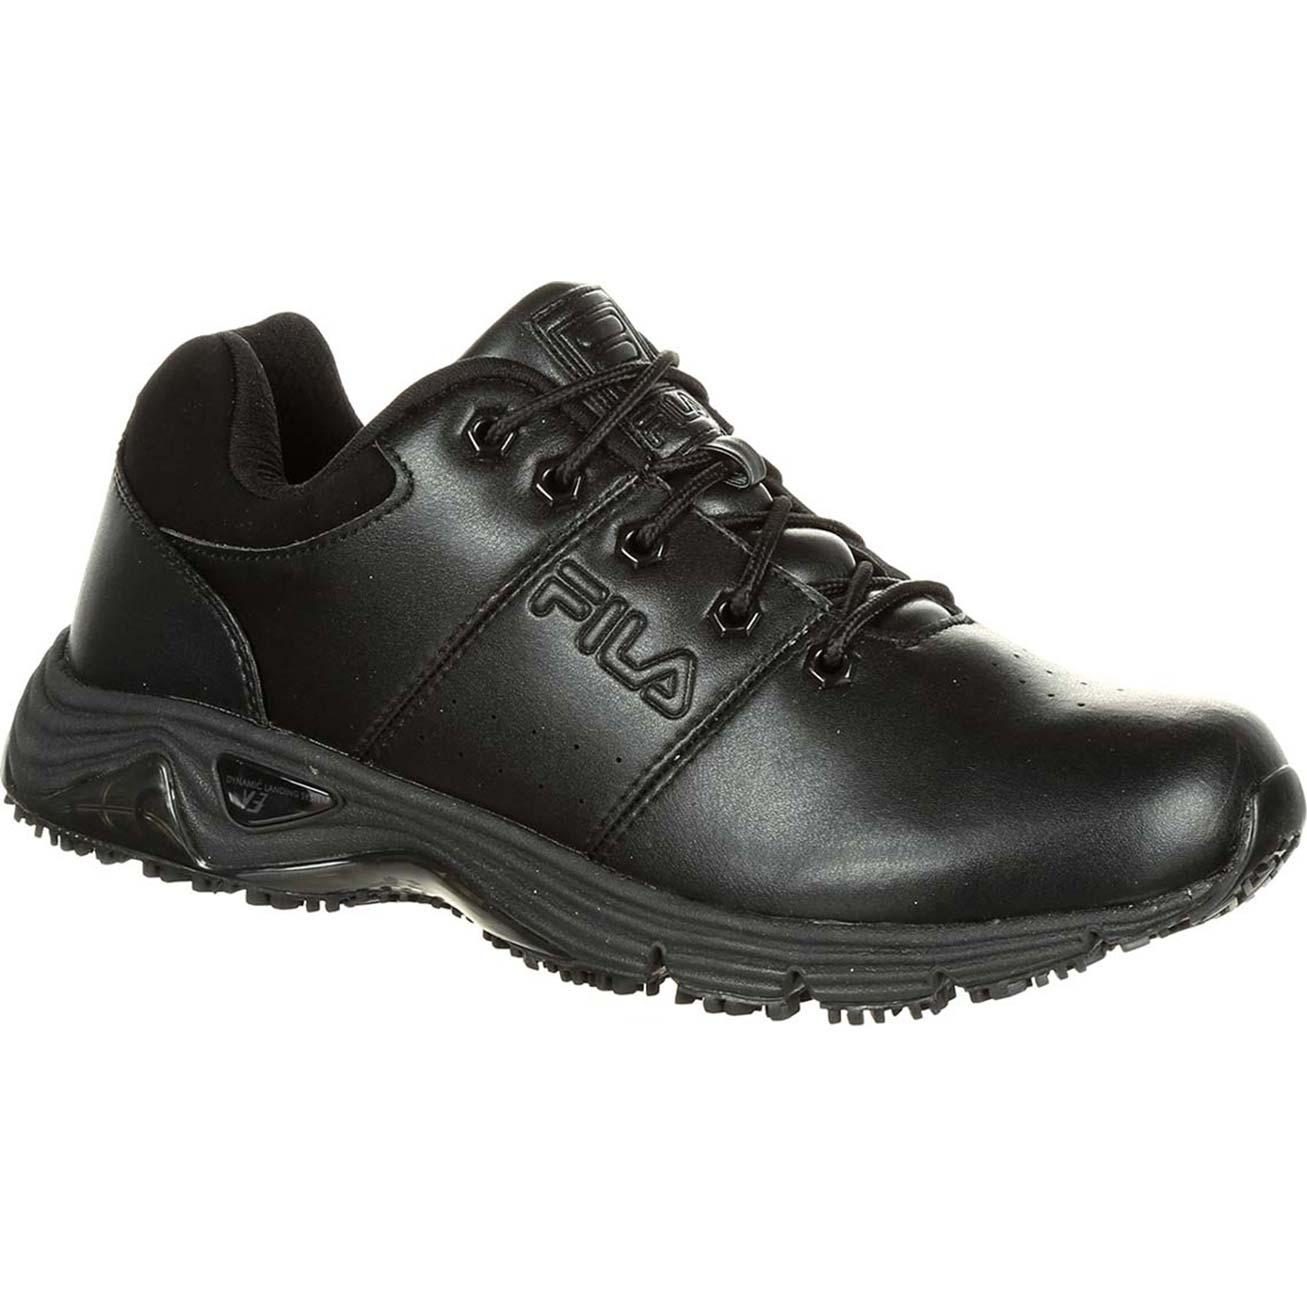 0a5497c75f Fila Memory Breach Steel Toe Slip-Resistant Work Athletic Shoe